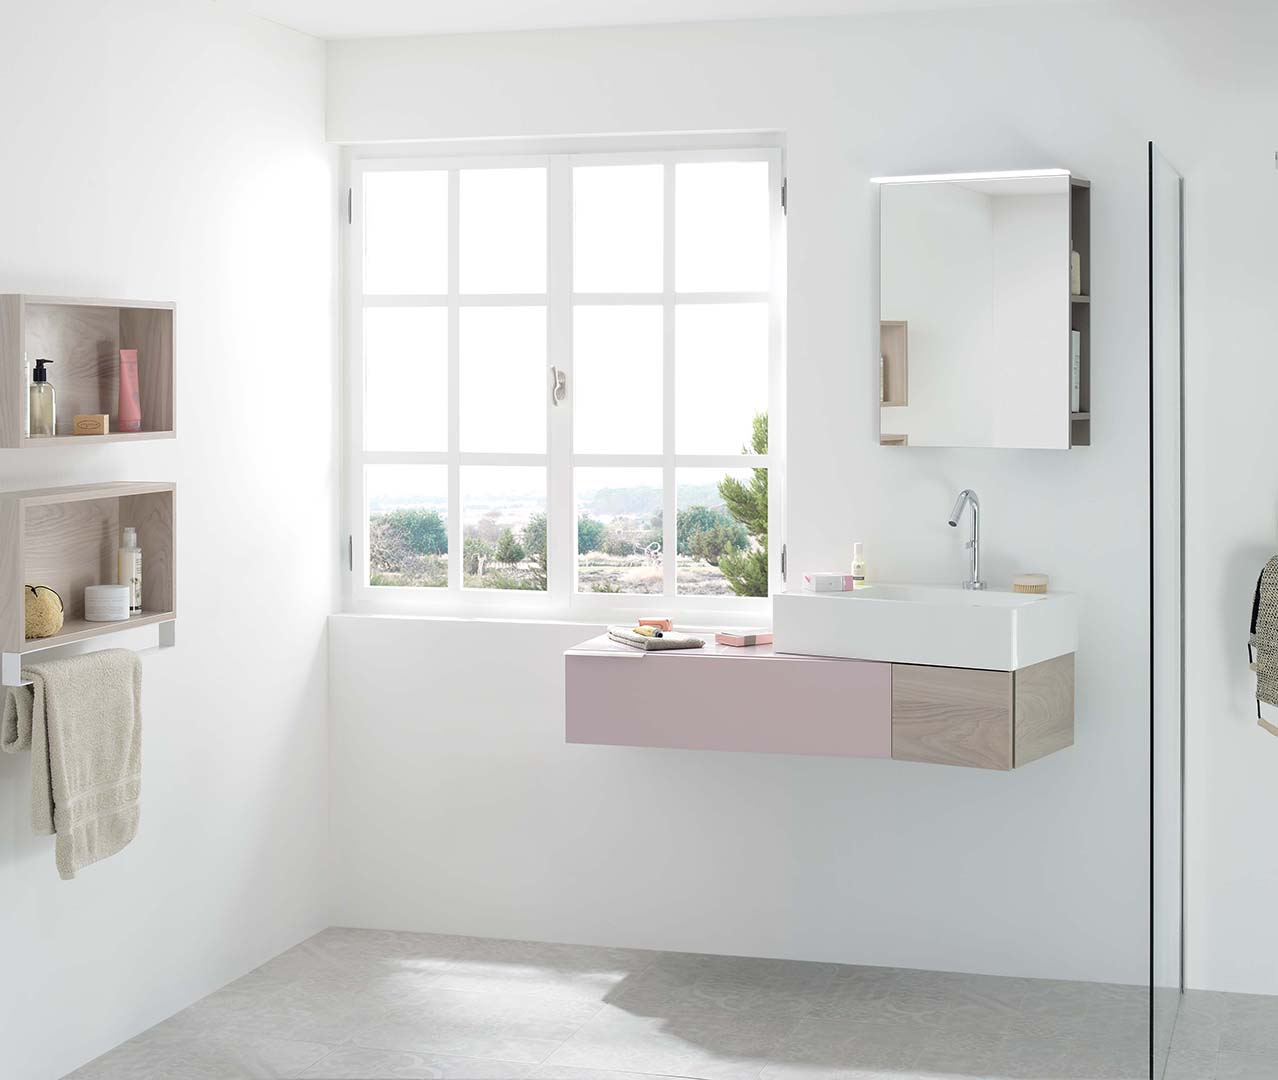 Das Sortiment Vertigo, Design-Badezimmer, Badezimmermöbel ...